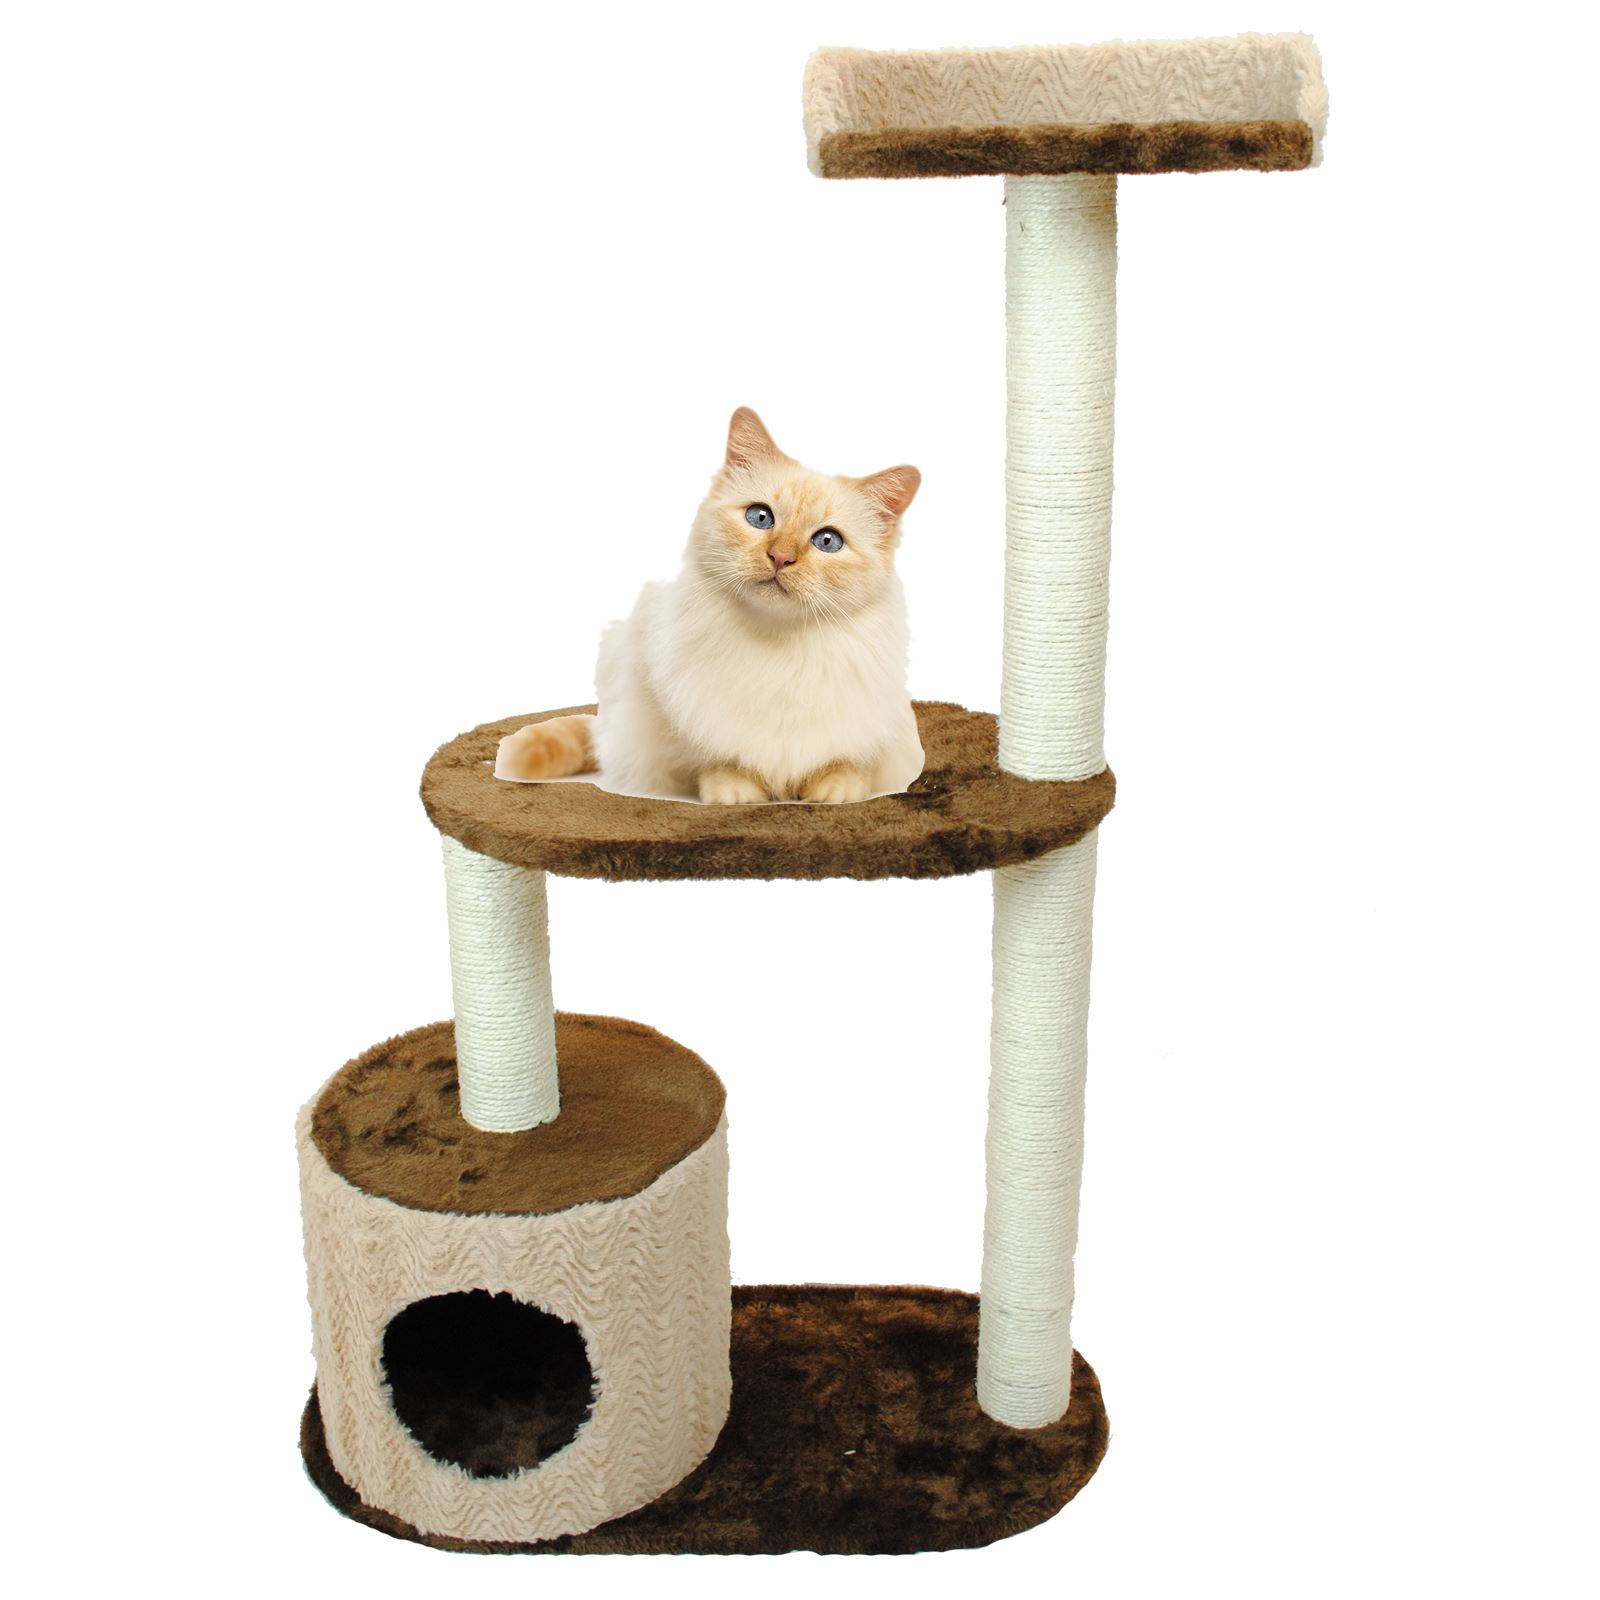 pet cat kitten play furniture climbing tree tower. Black Bedroom Furniture Sets. Home Design Ideas